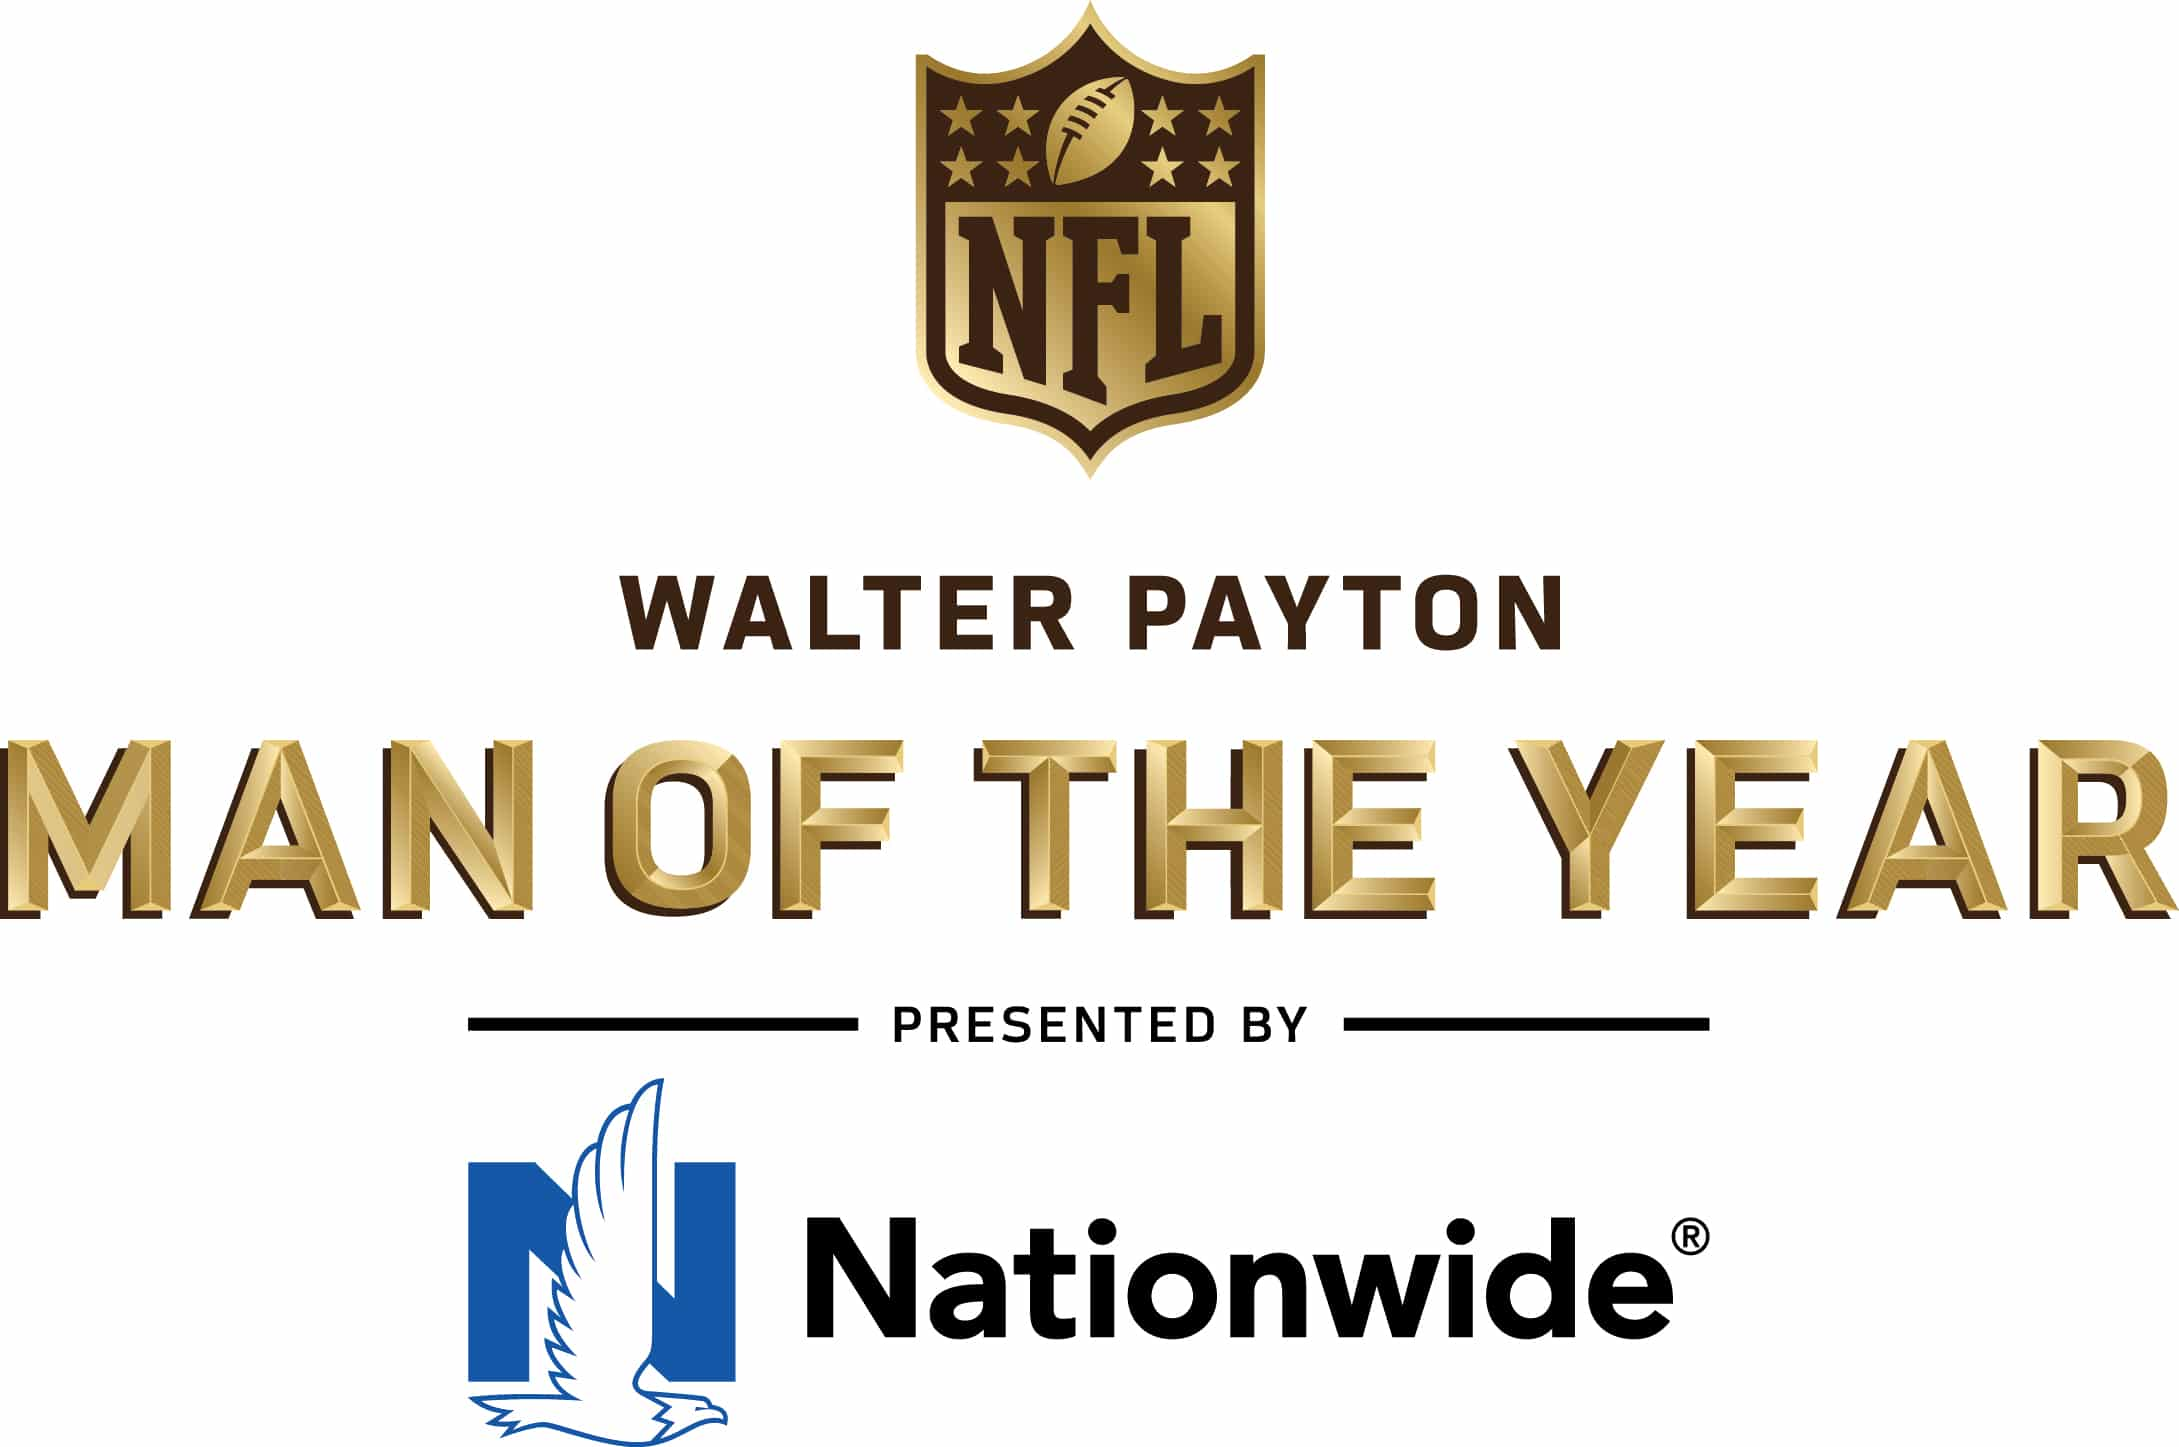 Walter Payton NFL Man Of The Year Award 2020